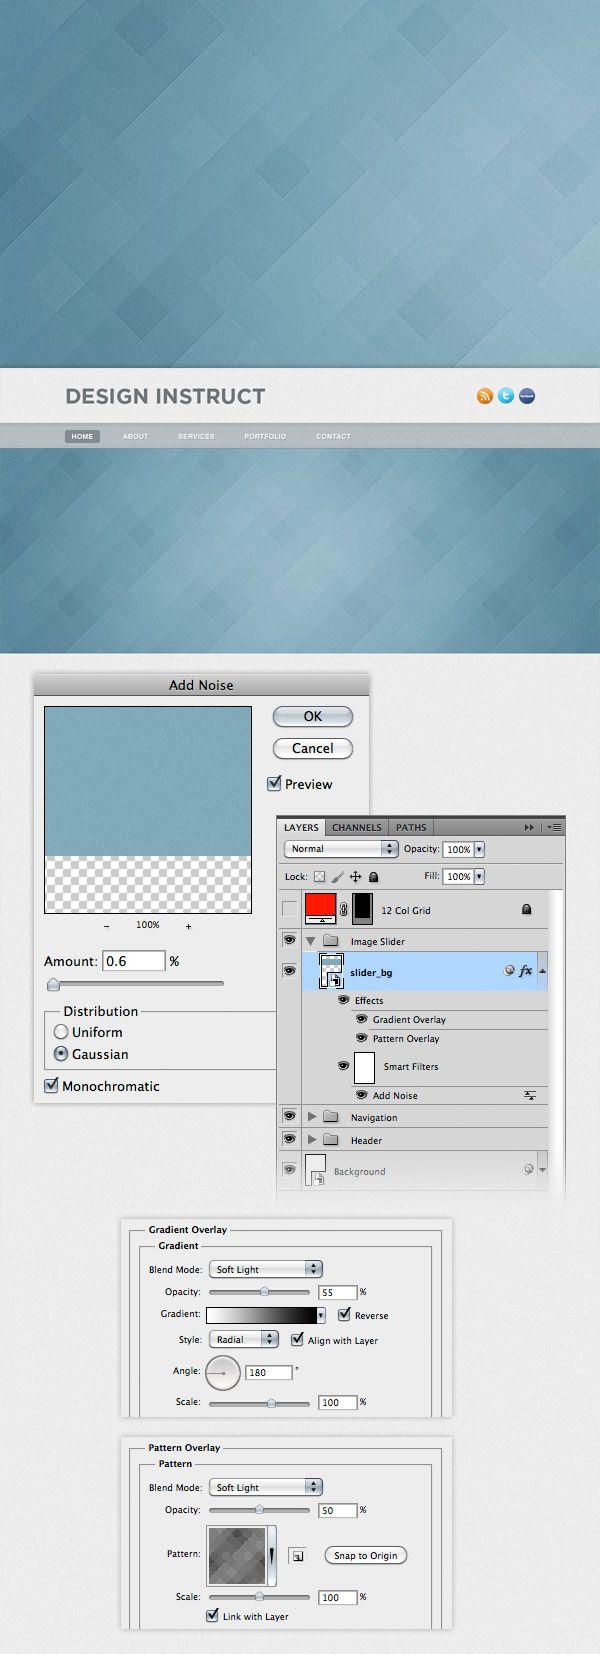 Layout photoshop web design website template tutorials tutorial 022 - Create A Light Textured Web Design In Photoshop